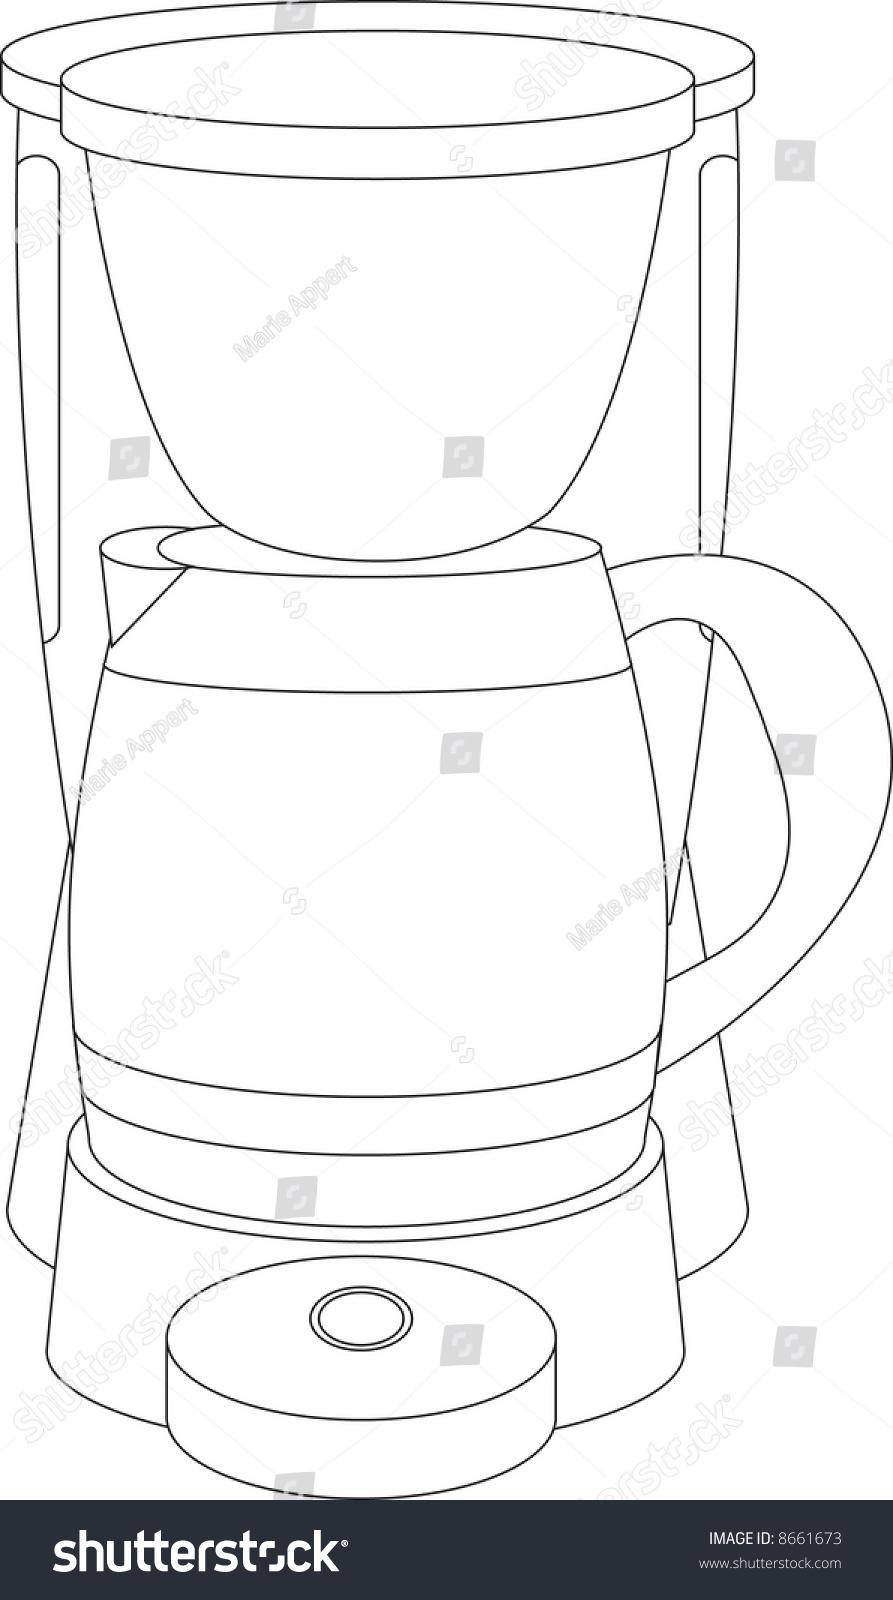 coffee maker wiring diagram coffee image wiring electrical drawing maker the wiring diagram on coffee maker wiring diagram